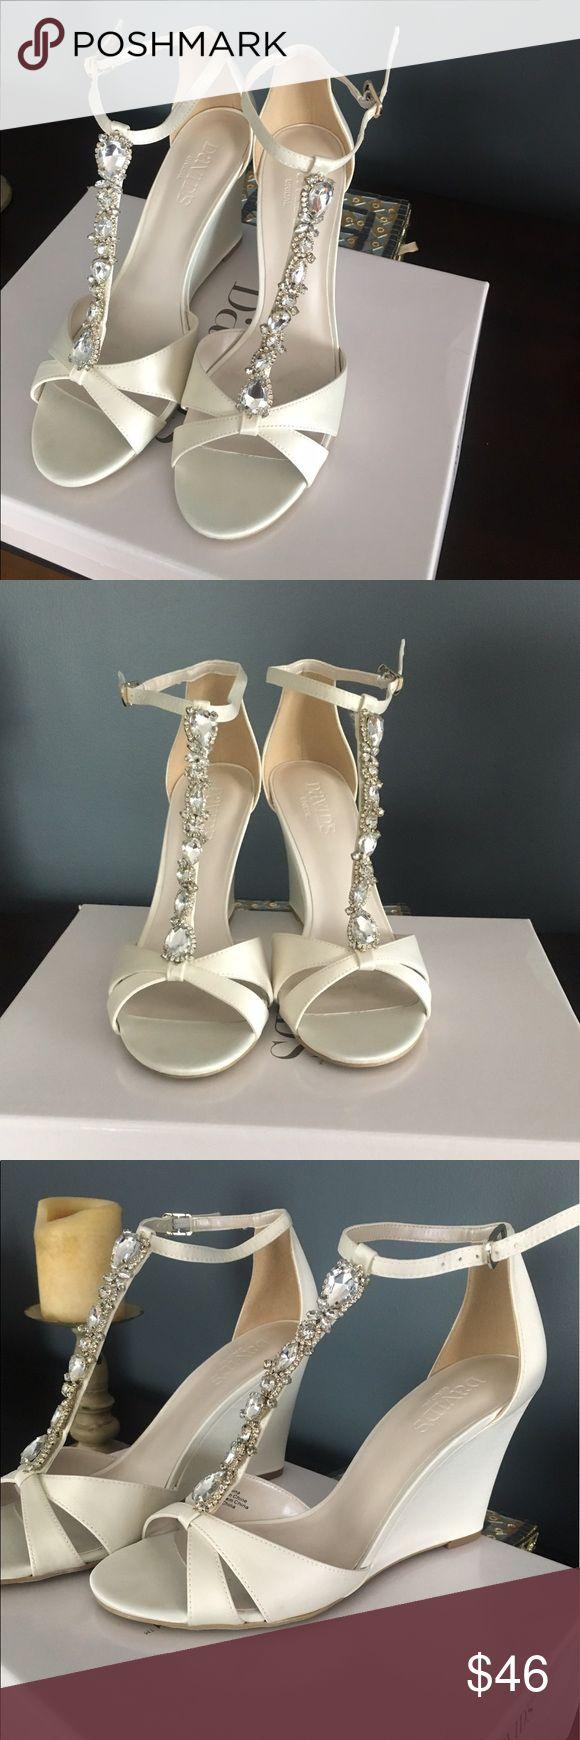 Bridal wedges Size 8 Davids bridal brand new David's Bridal Shoes Wedges